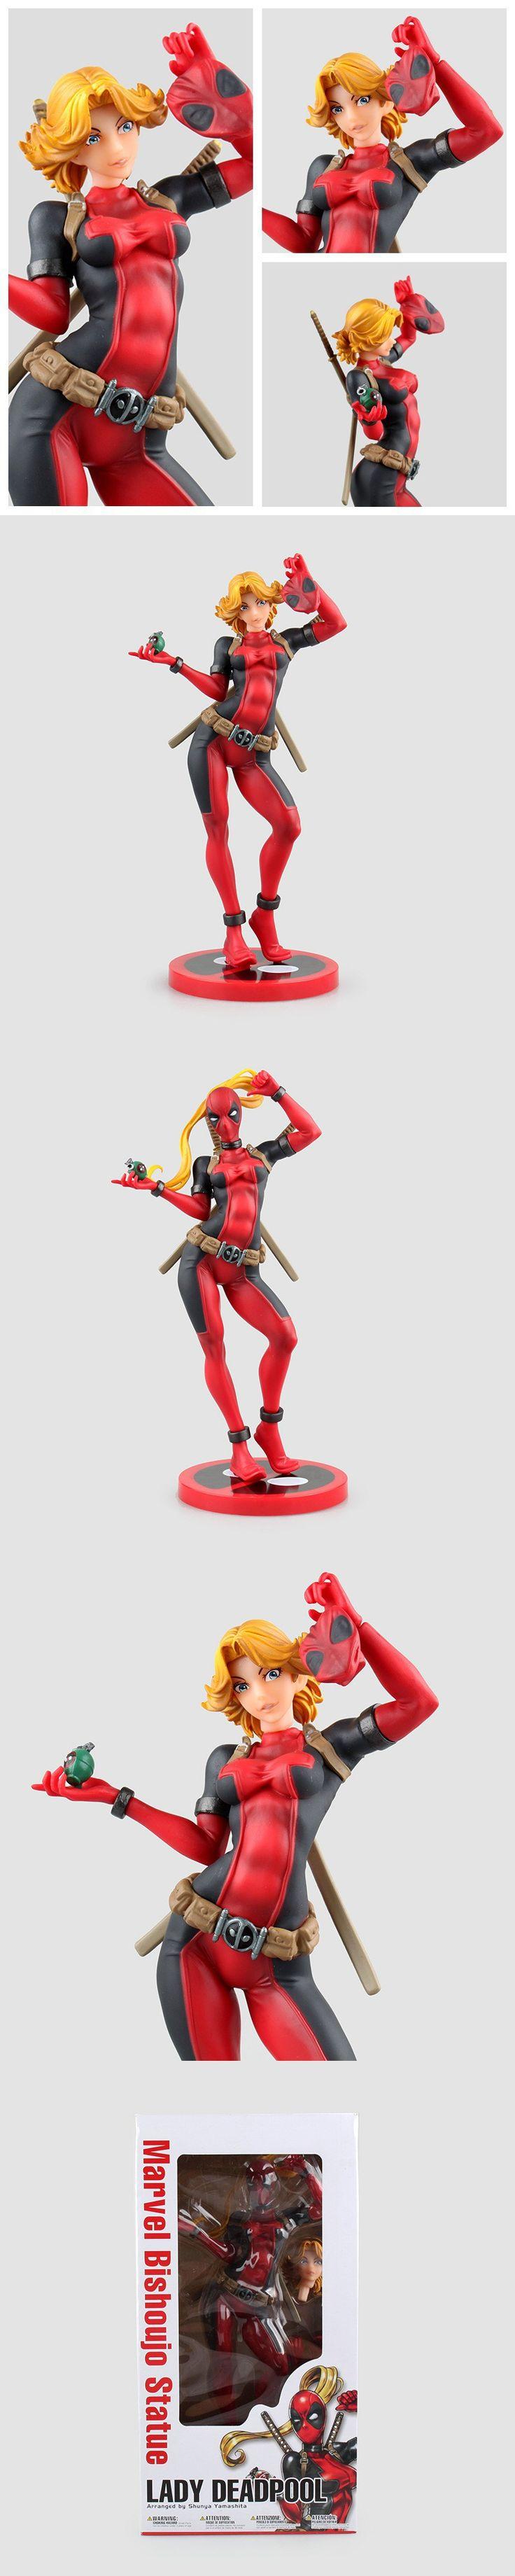 Revoltech X-men Deadpool Figure Deadpool Girl PVC Action Figure Brinquedos Figuras Anime Collectible Kids Toys Doll 23cm